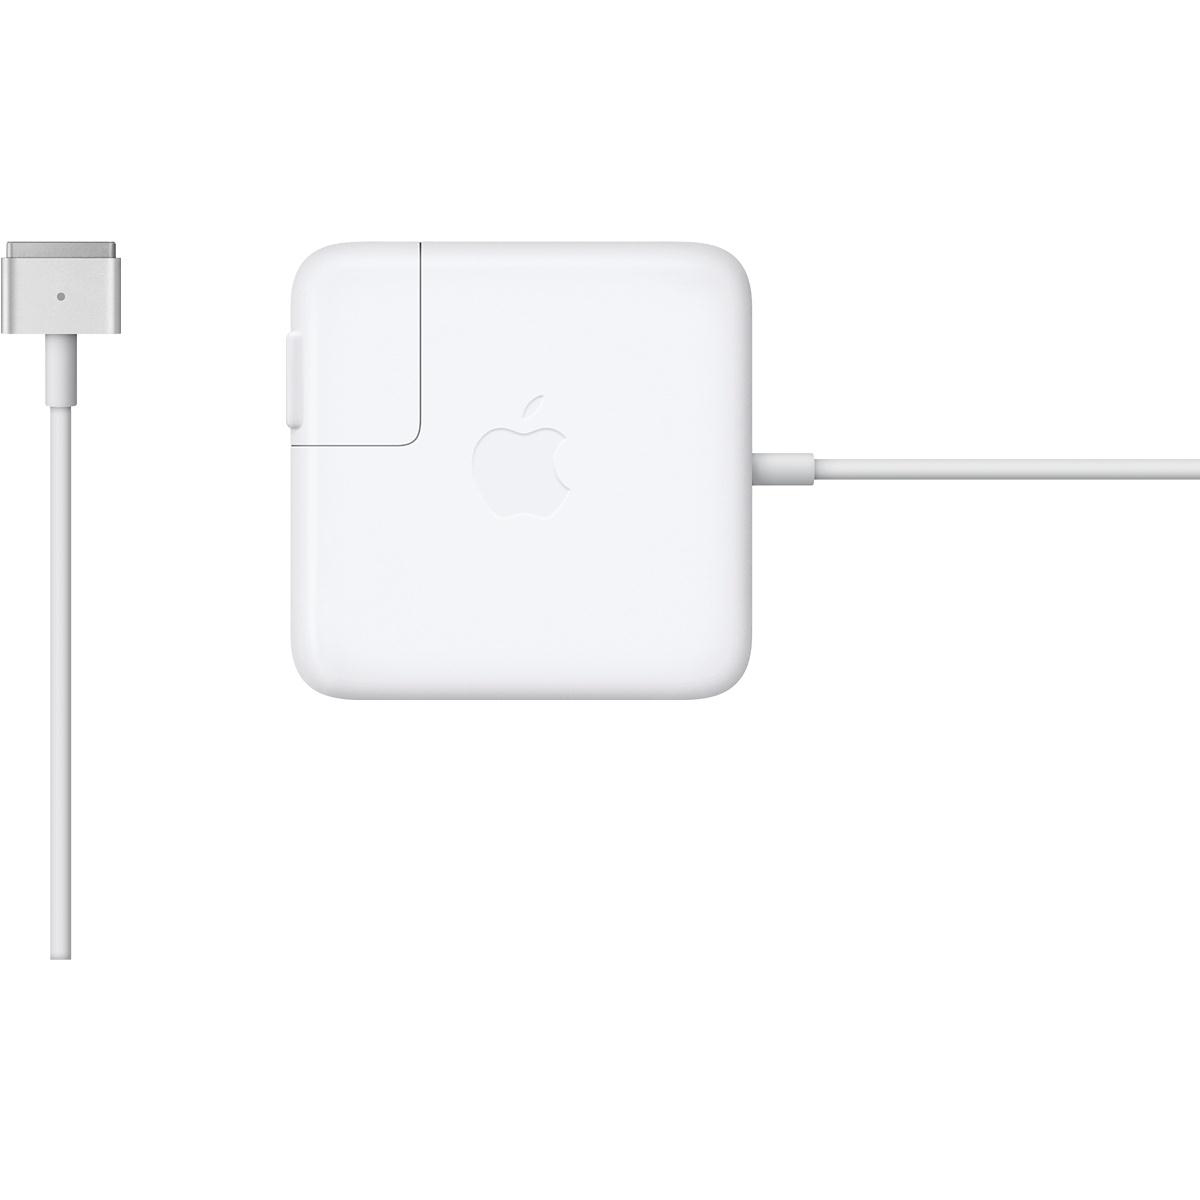 Apple Magsafe 2 Power Adaptor for MacBook Pro Retina Display 85W White Ref MD506B/B